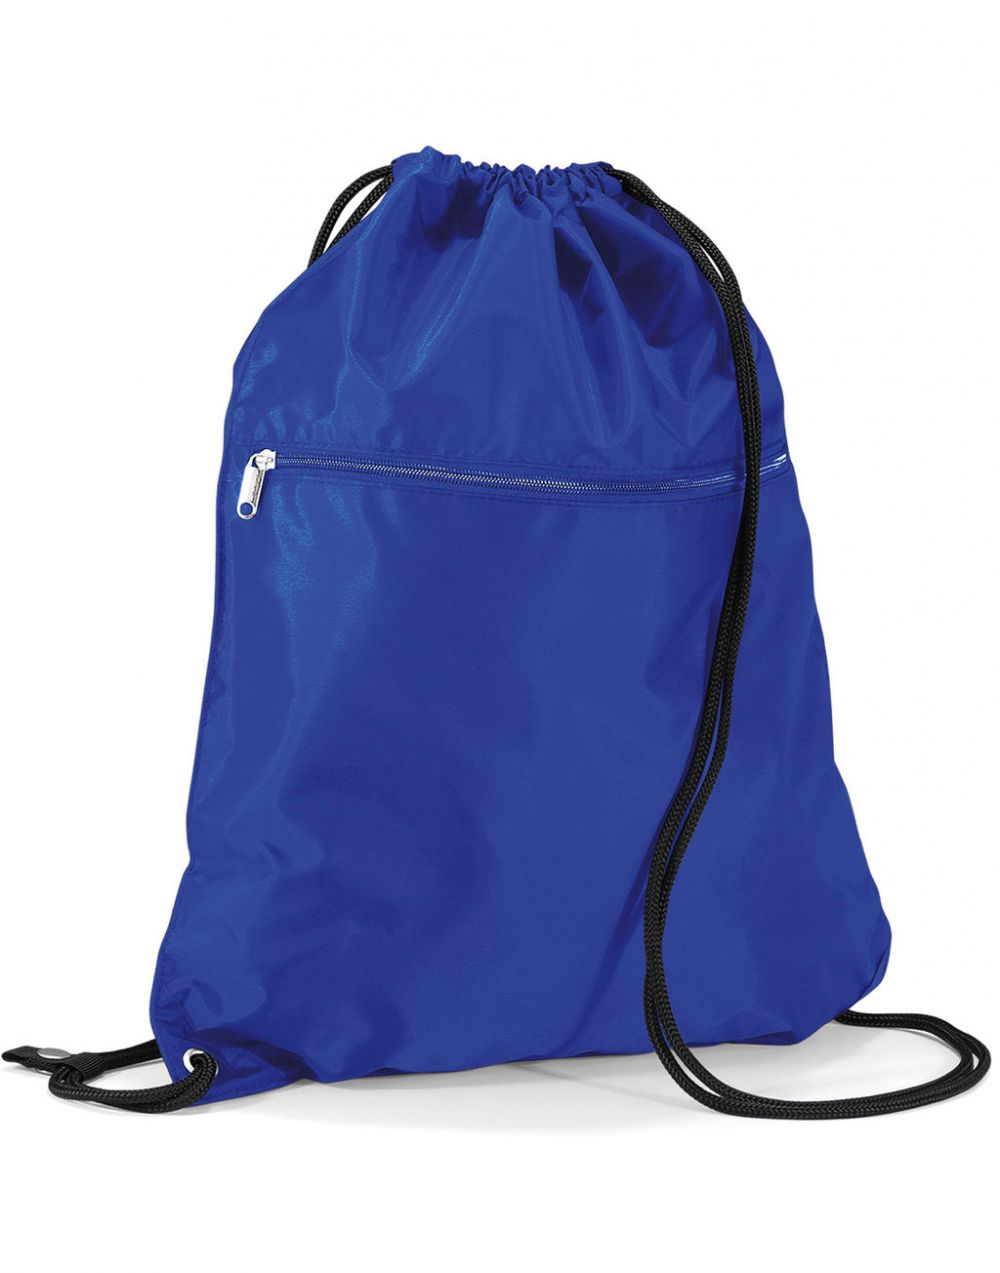 Mochila cuerdas personalizada quadra mochila vista 4